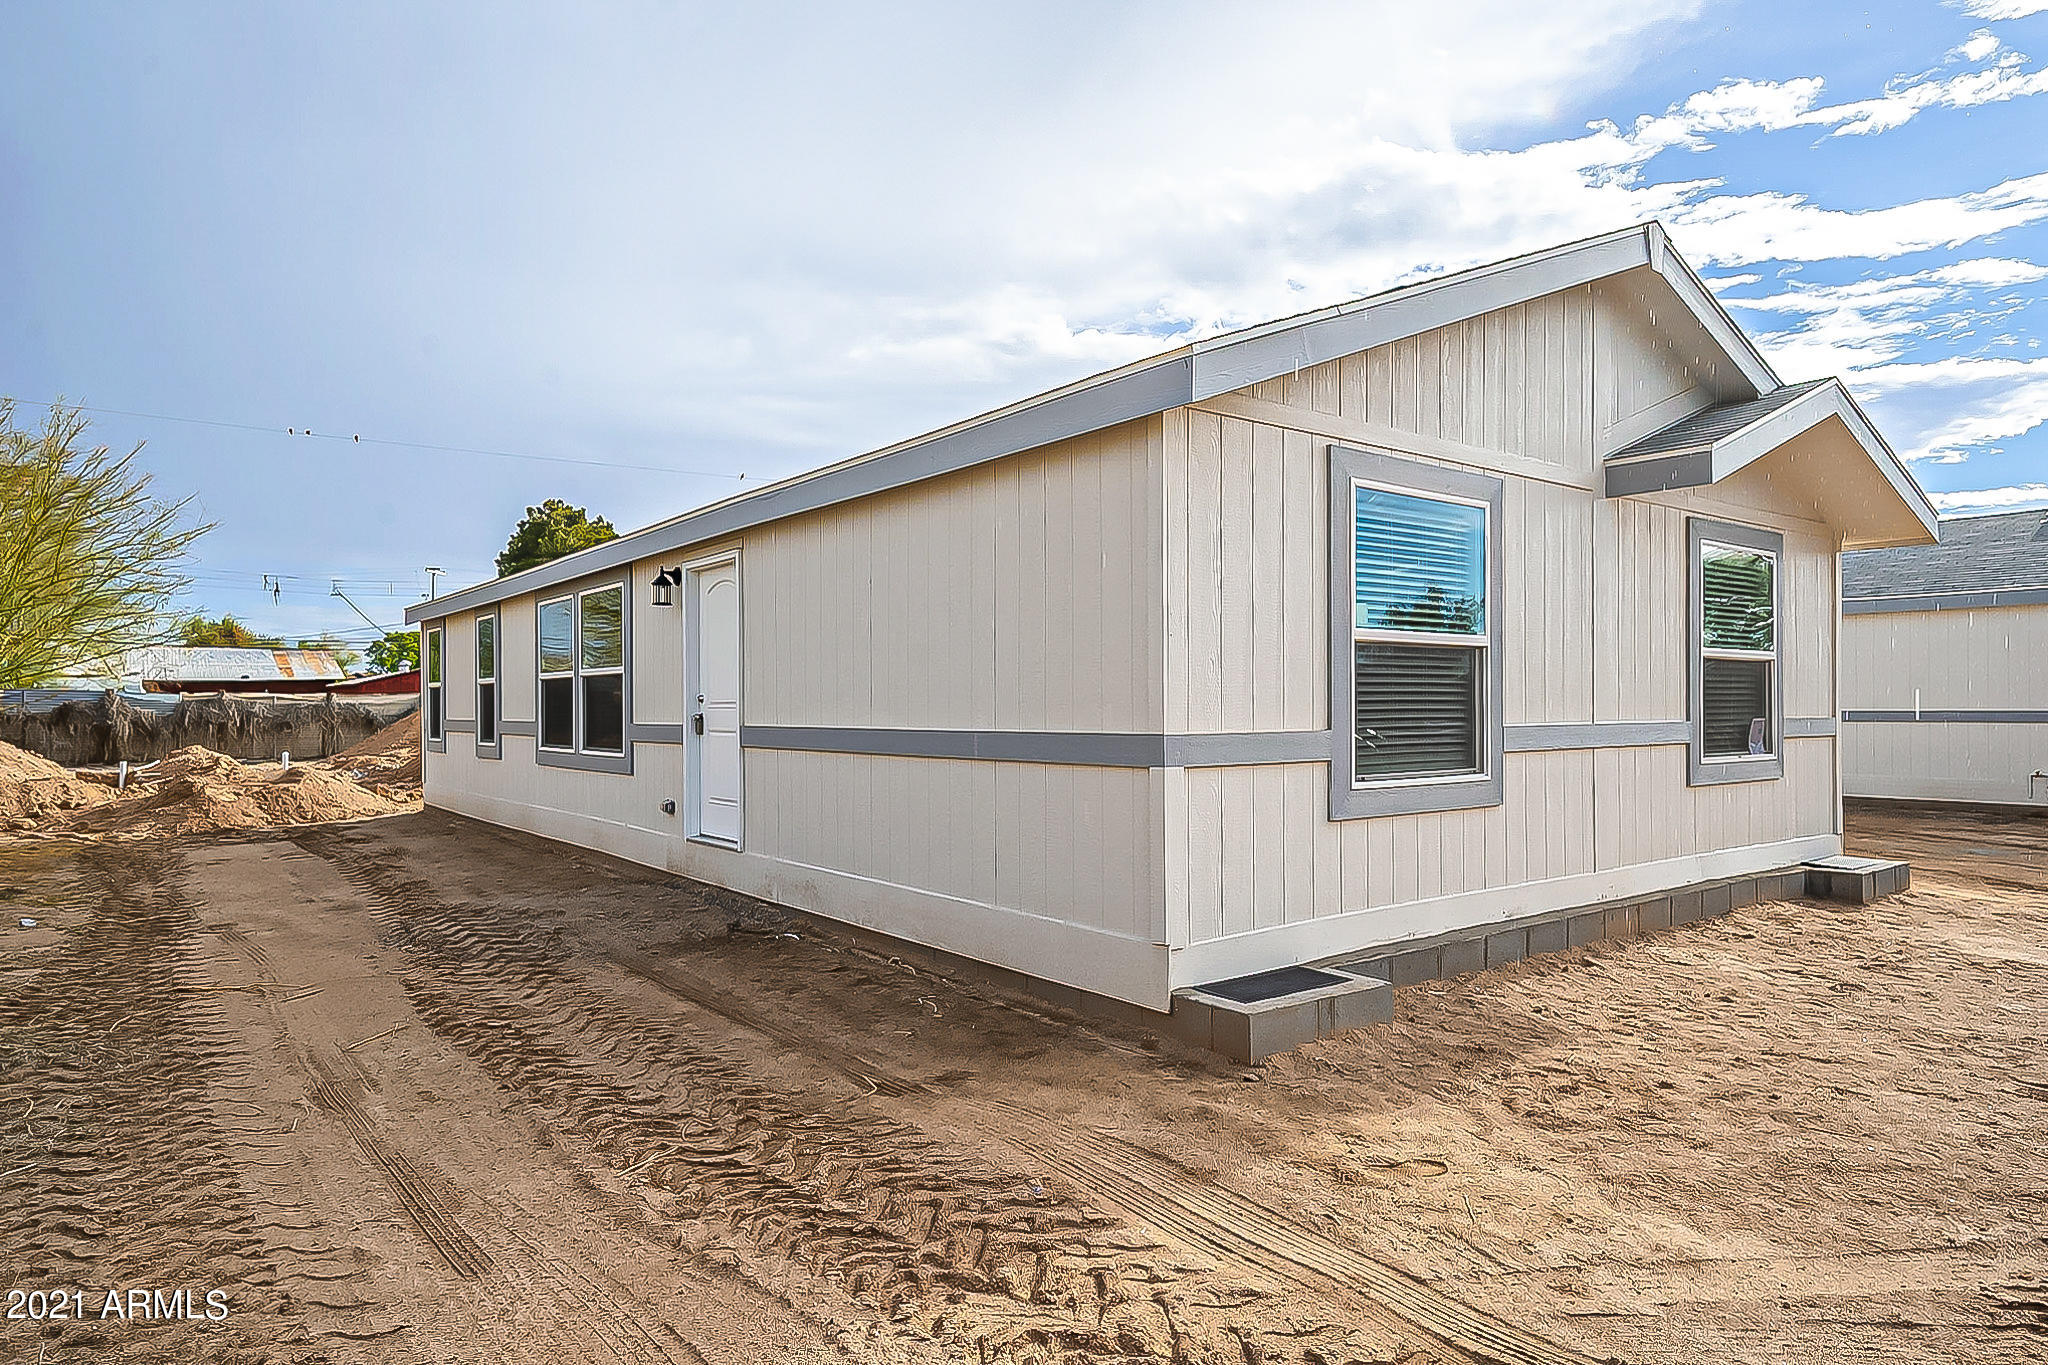 218 6TH Avenue E, Buckeye, AZ 85326, 3 Bedrooms Bedrooms, ,Residential,For Sale,218 6TH Avenue E,6192093